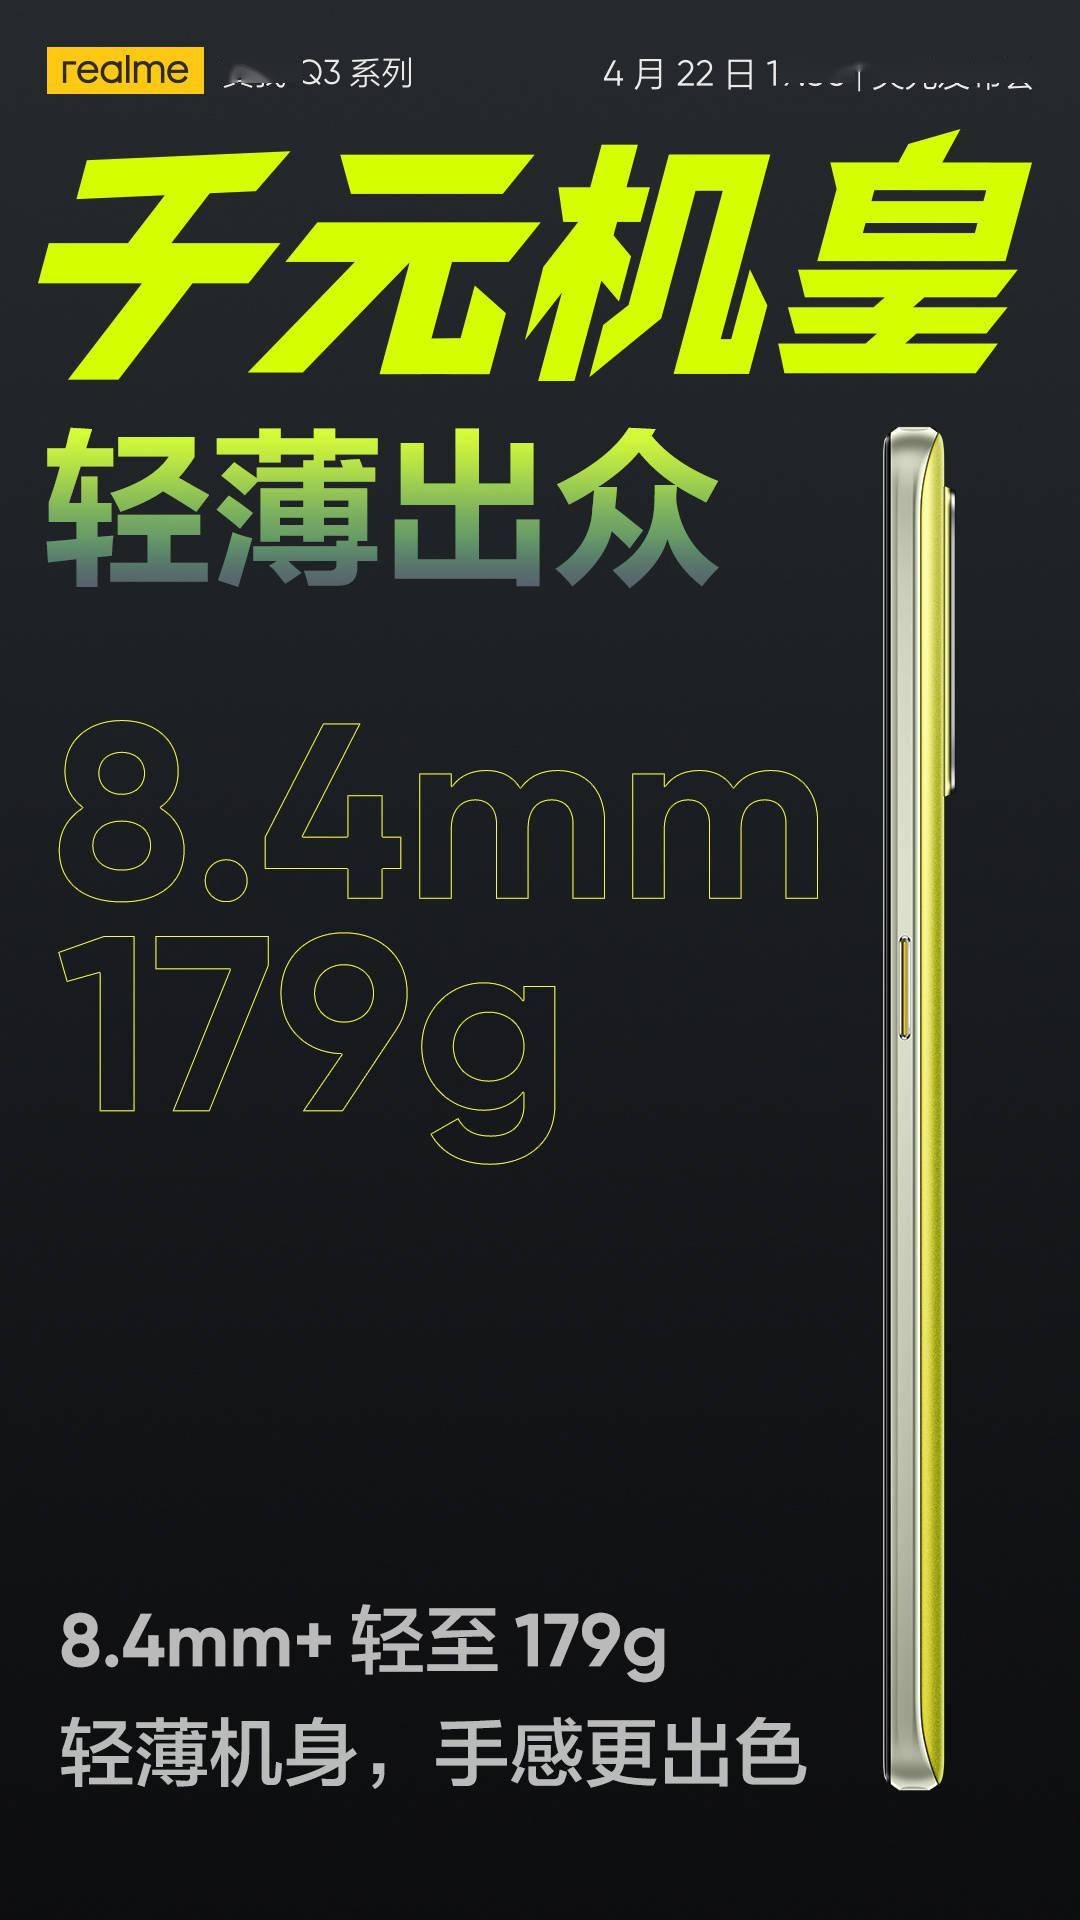 realme 真我 Q3 系列侧视图公布:厚度 8.4mm,重量 179g